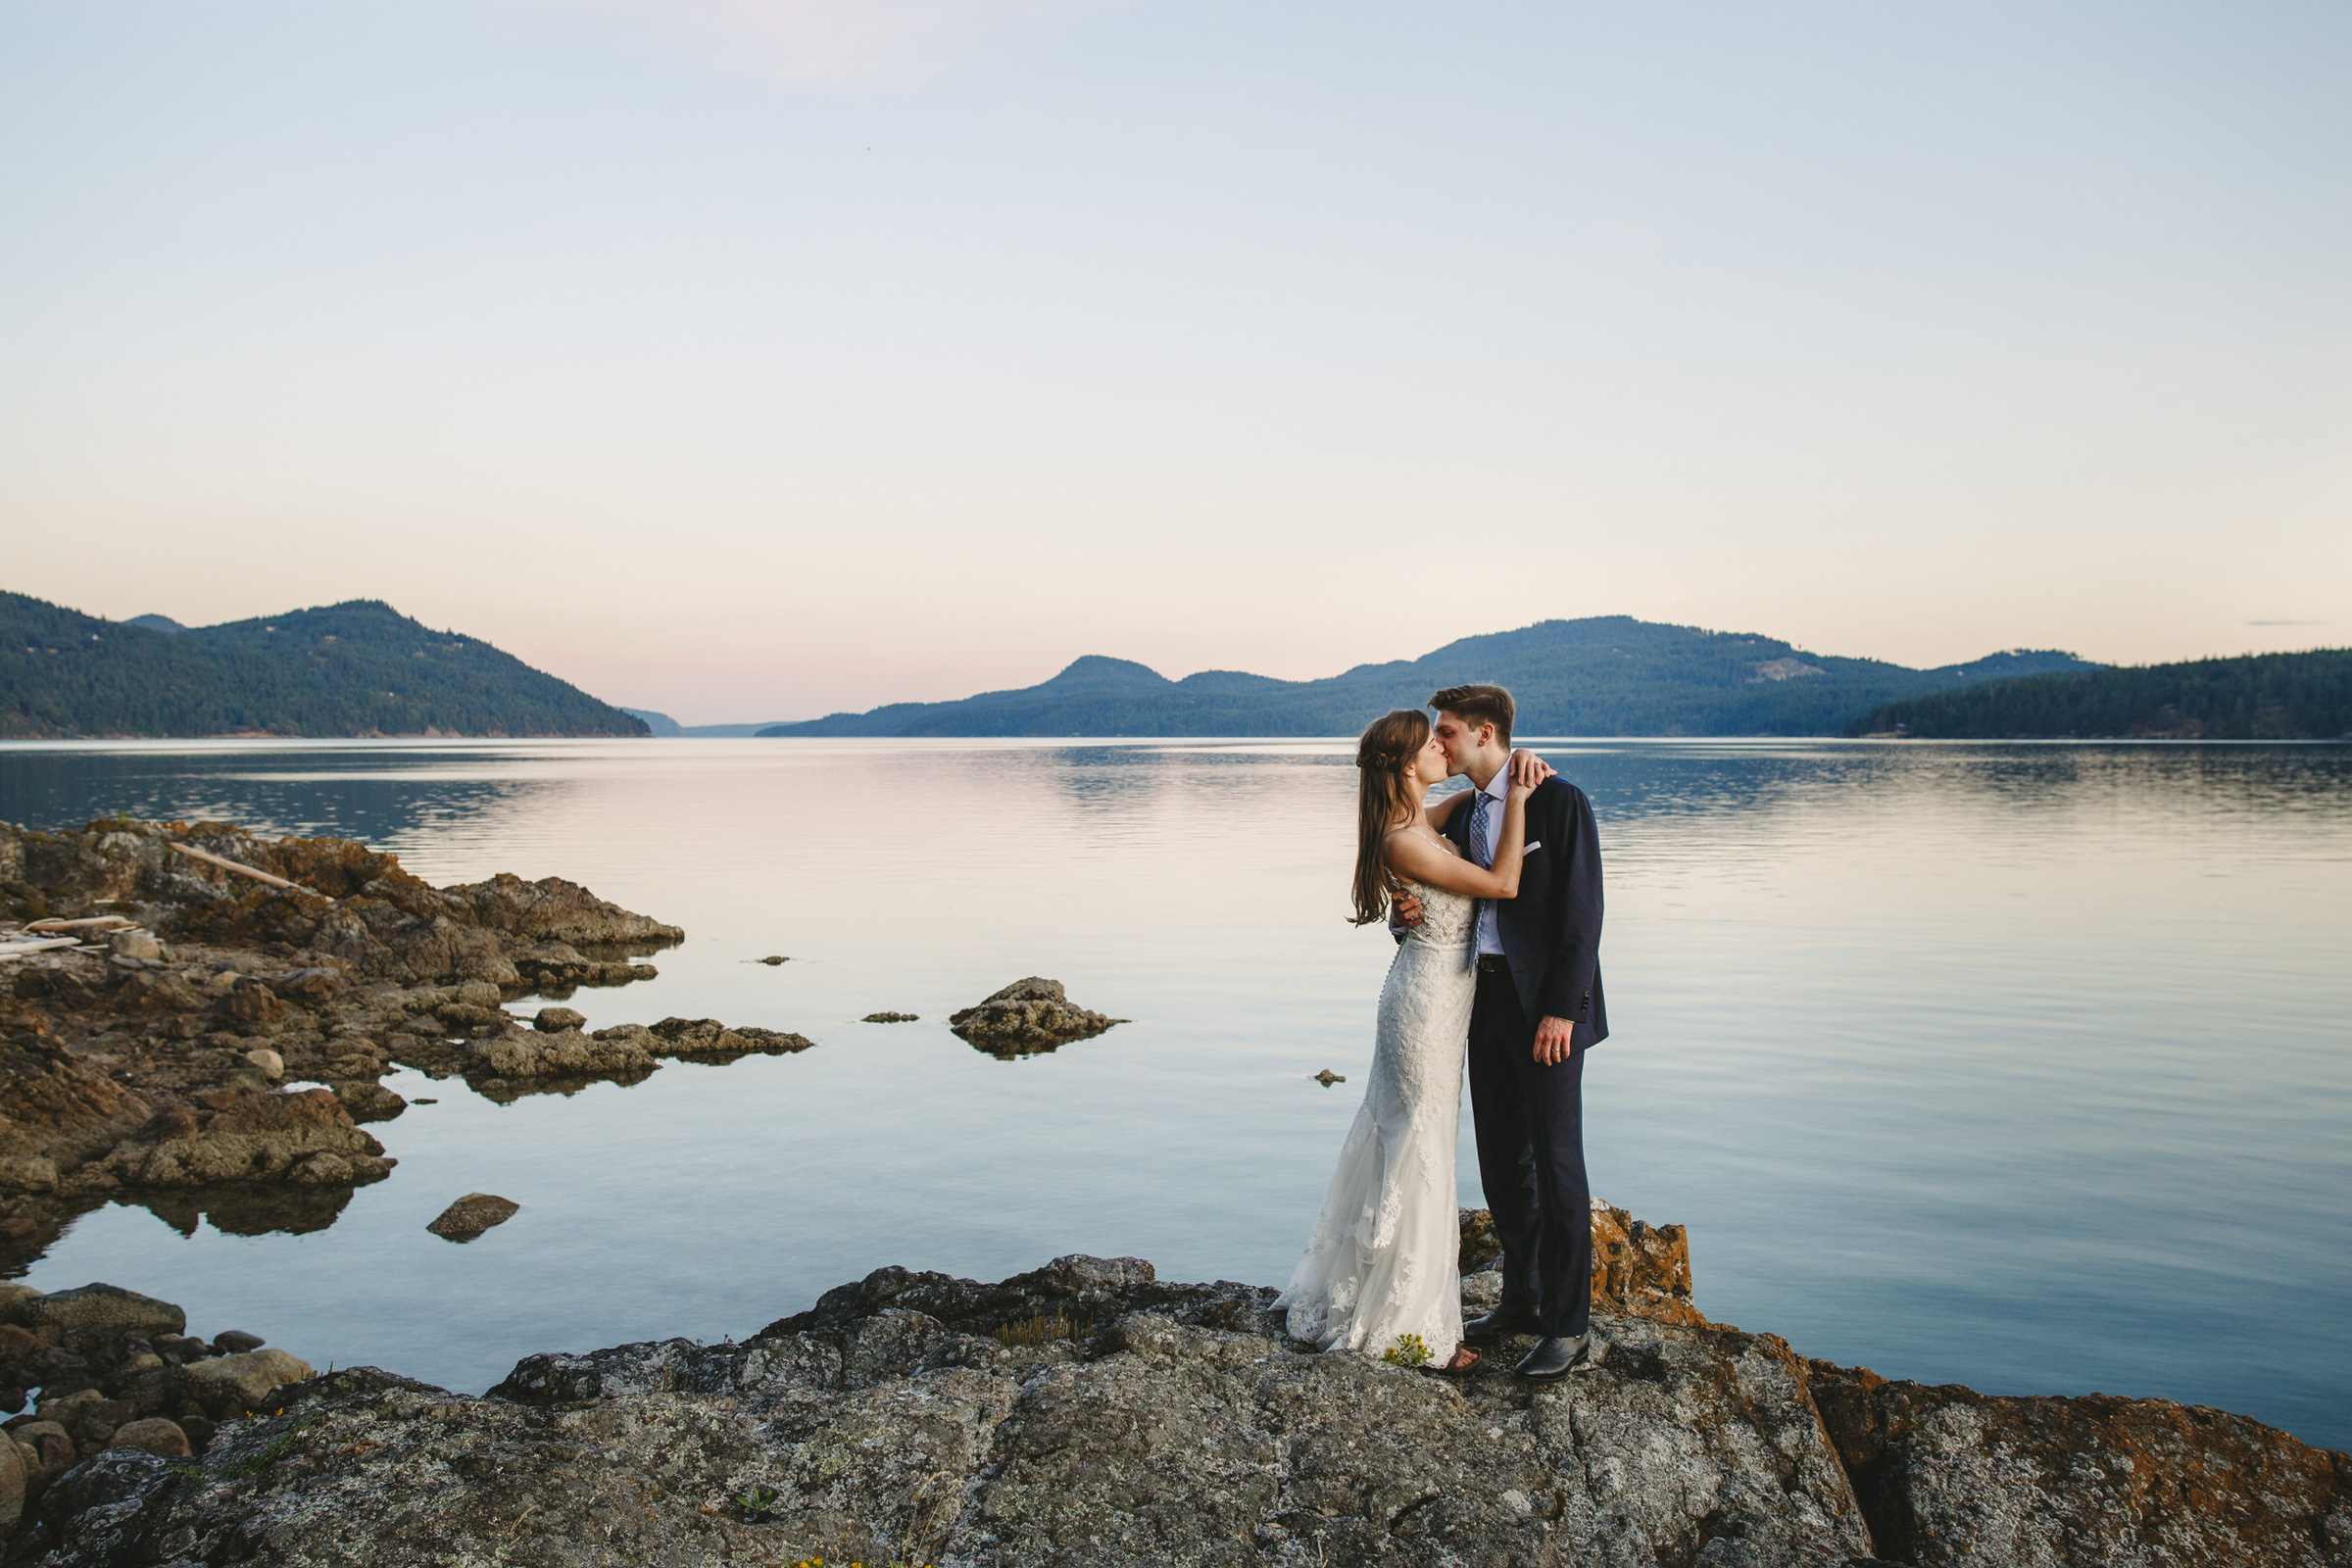 couple-kiss-on-shoreline-rocks-against-mountains-satya-curcio-photography